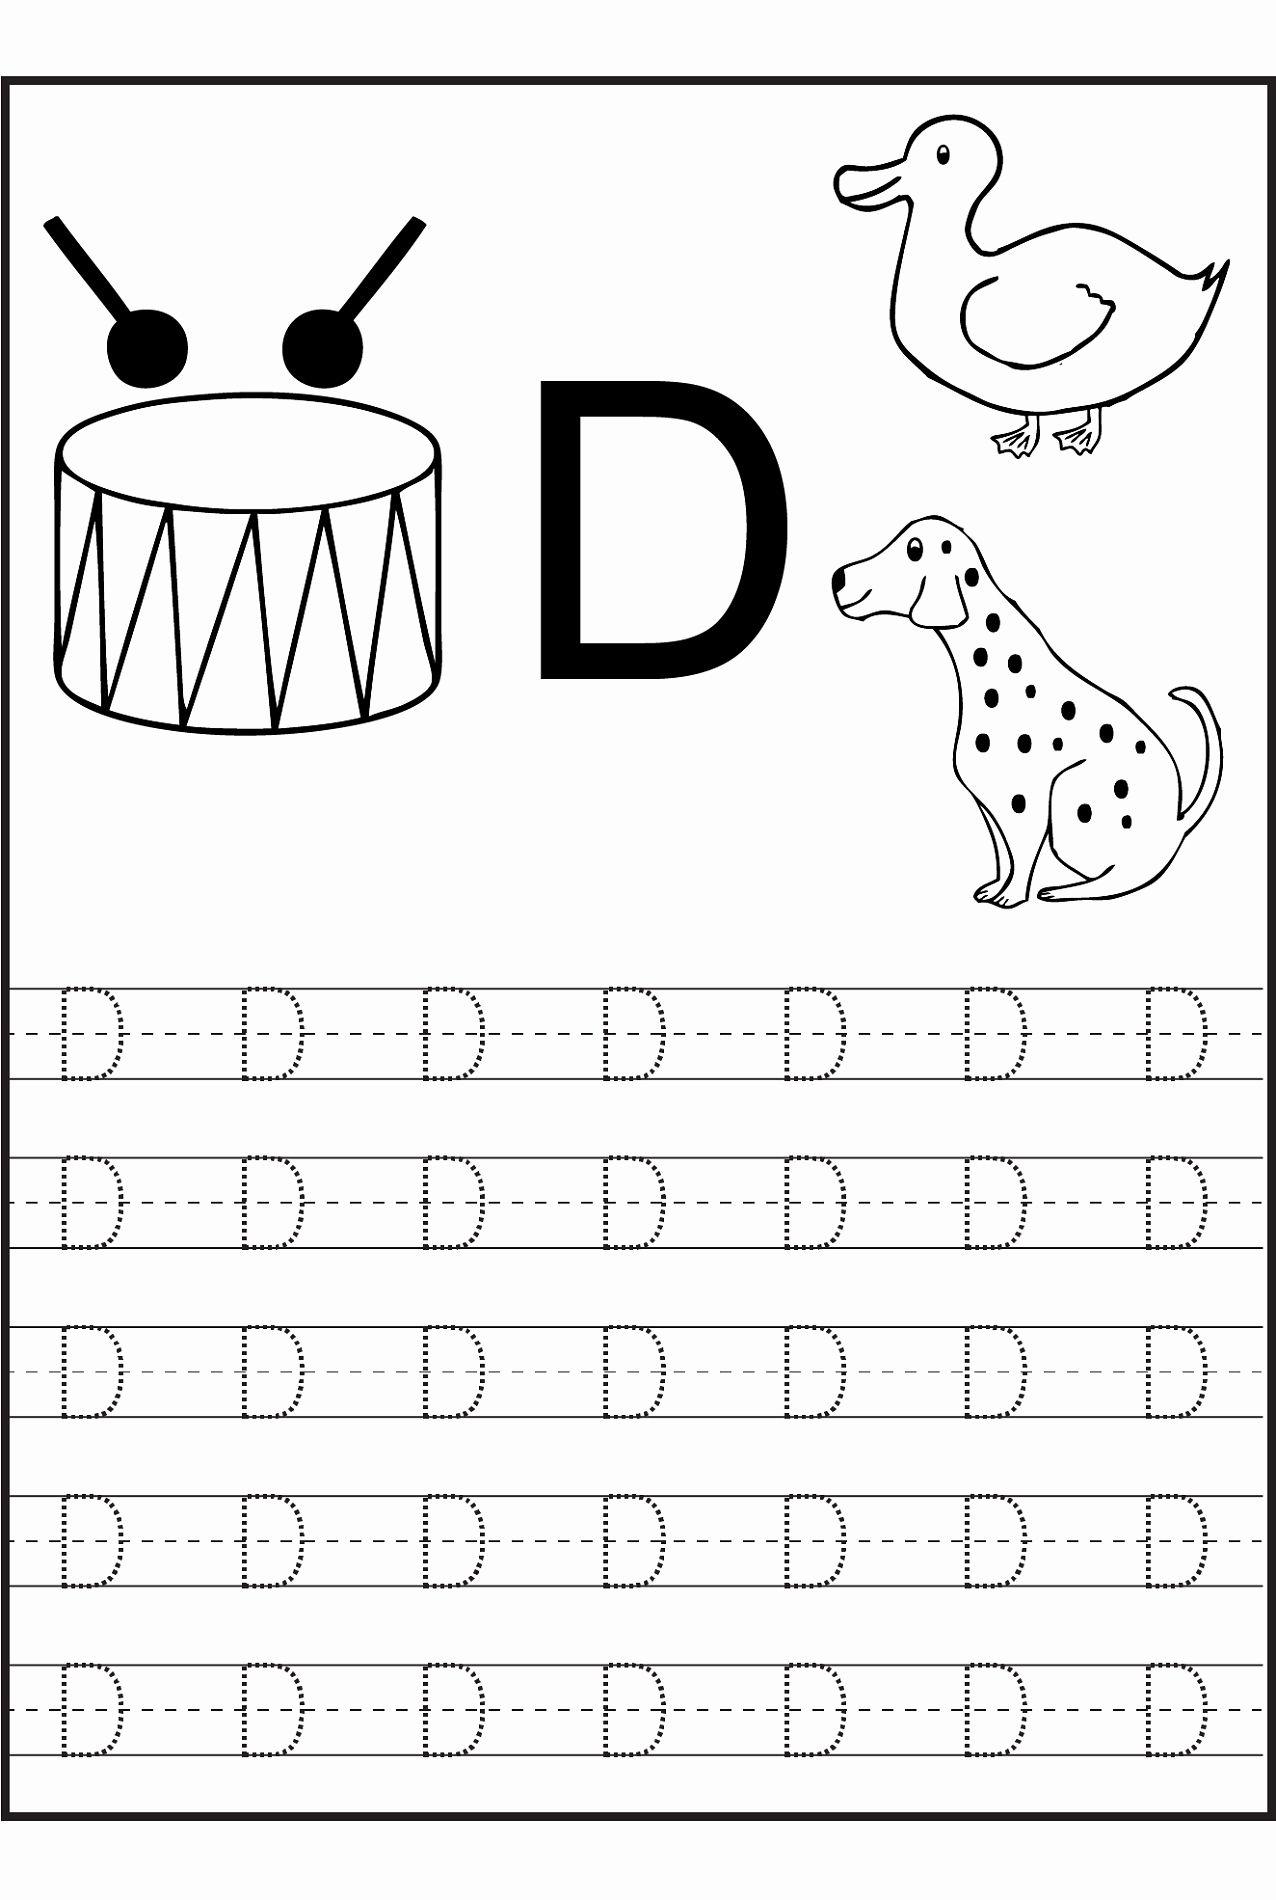 Letter D Worksheet For Preschool Beautiful Trace Letter D